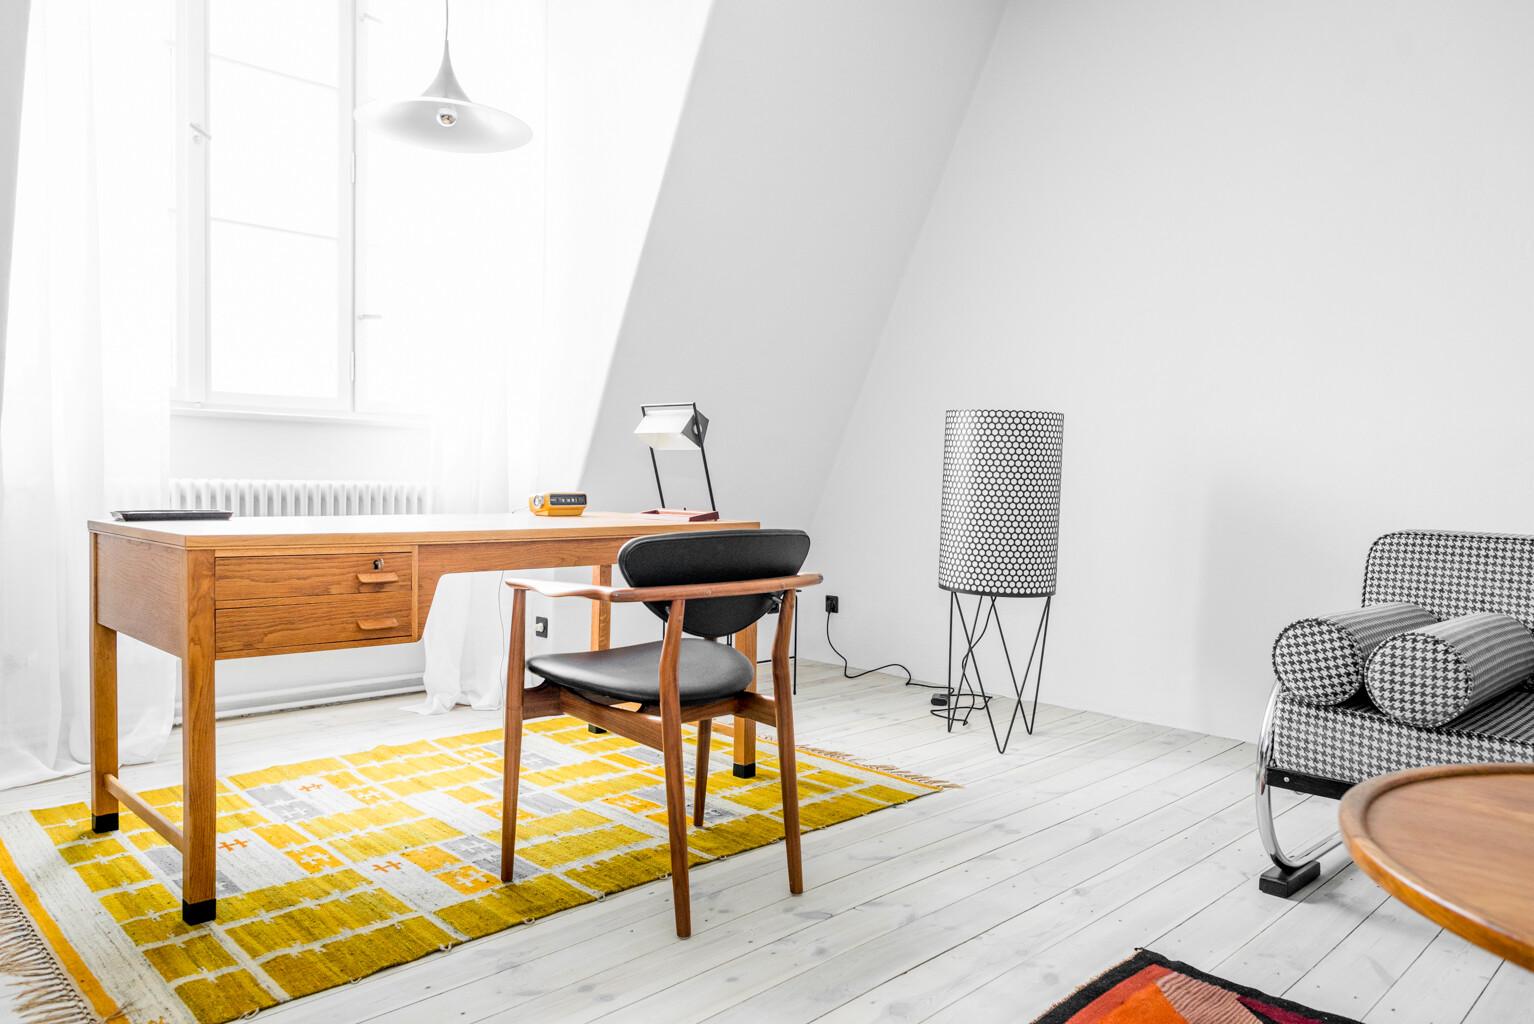 Loft berlin interior design by jacek kolasinski for Product design berlin